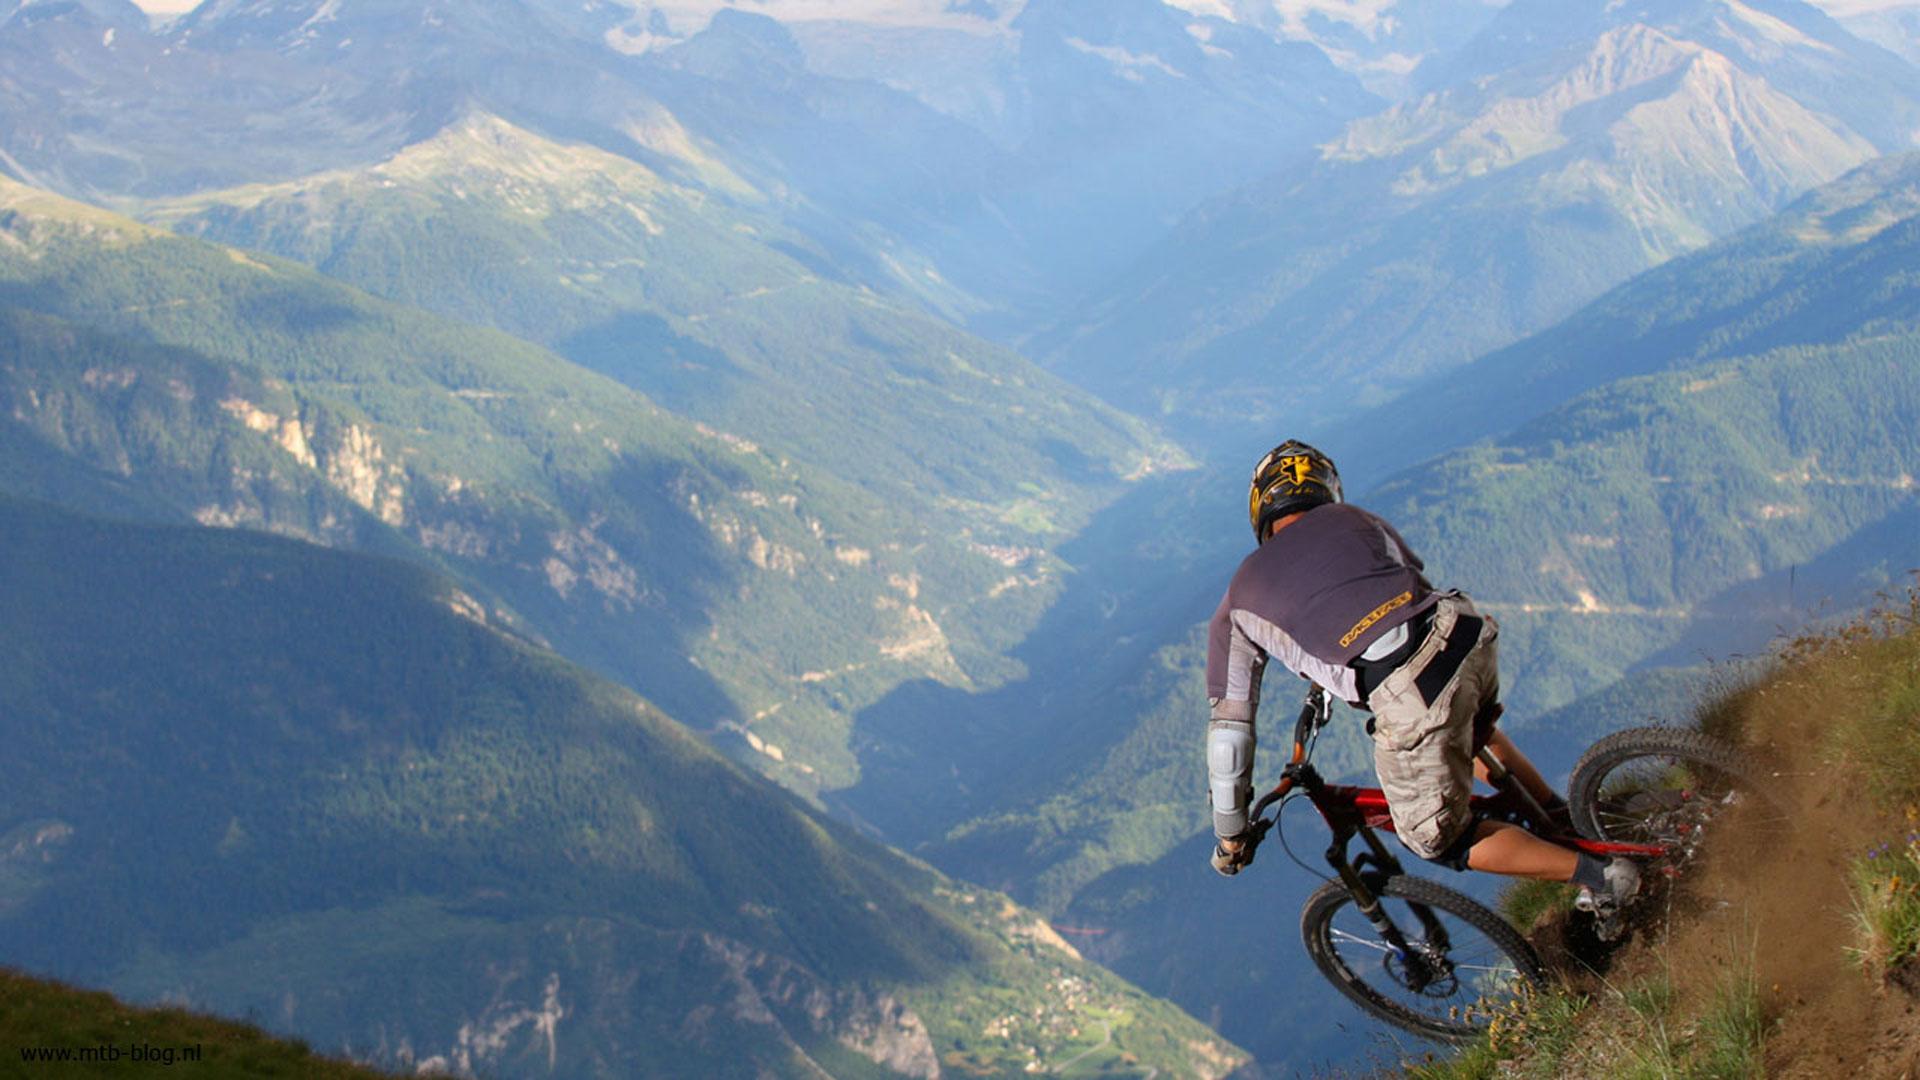 Download Mountain Biking 7335 1920x1080 Px High Definition Wallpaper